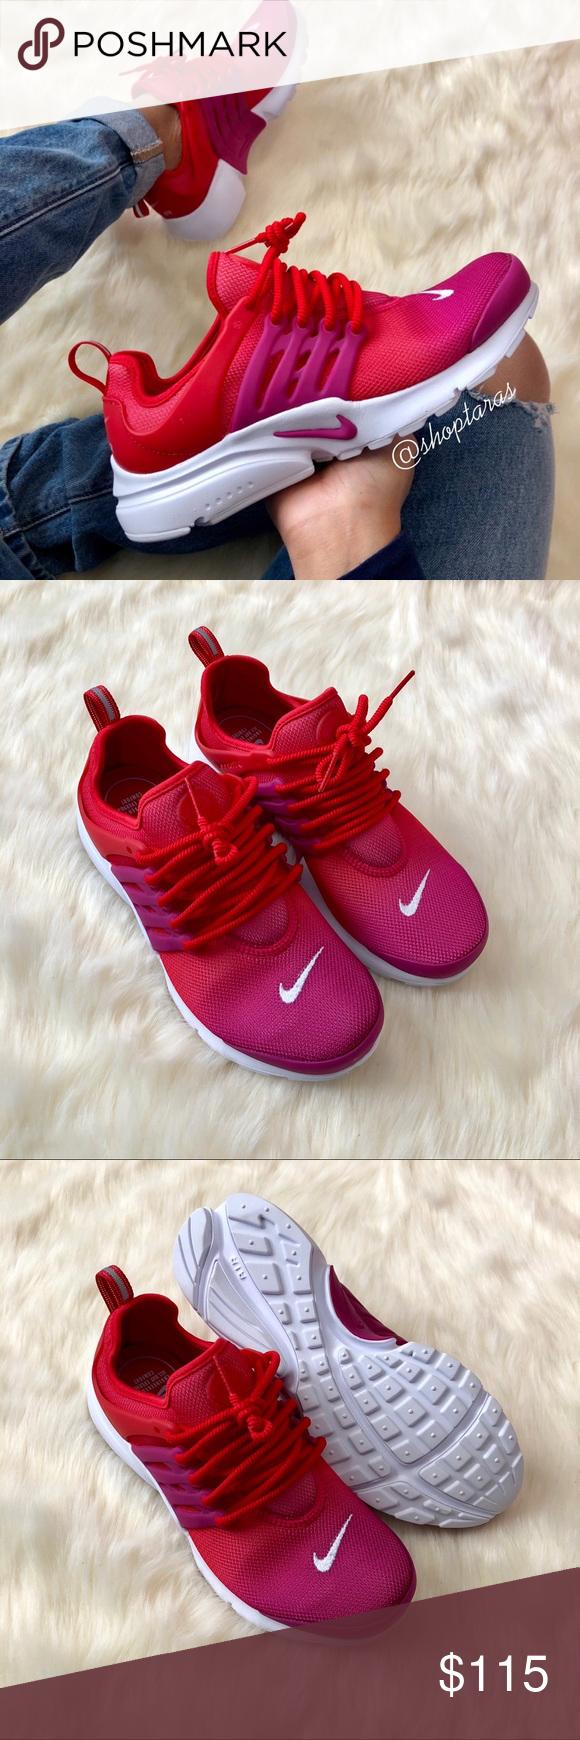 Brand New Nike Air Presto Ombré Red + Fuchsia NWT New